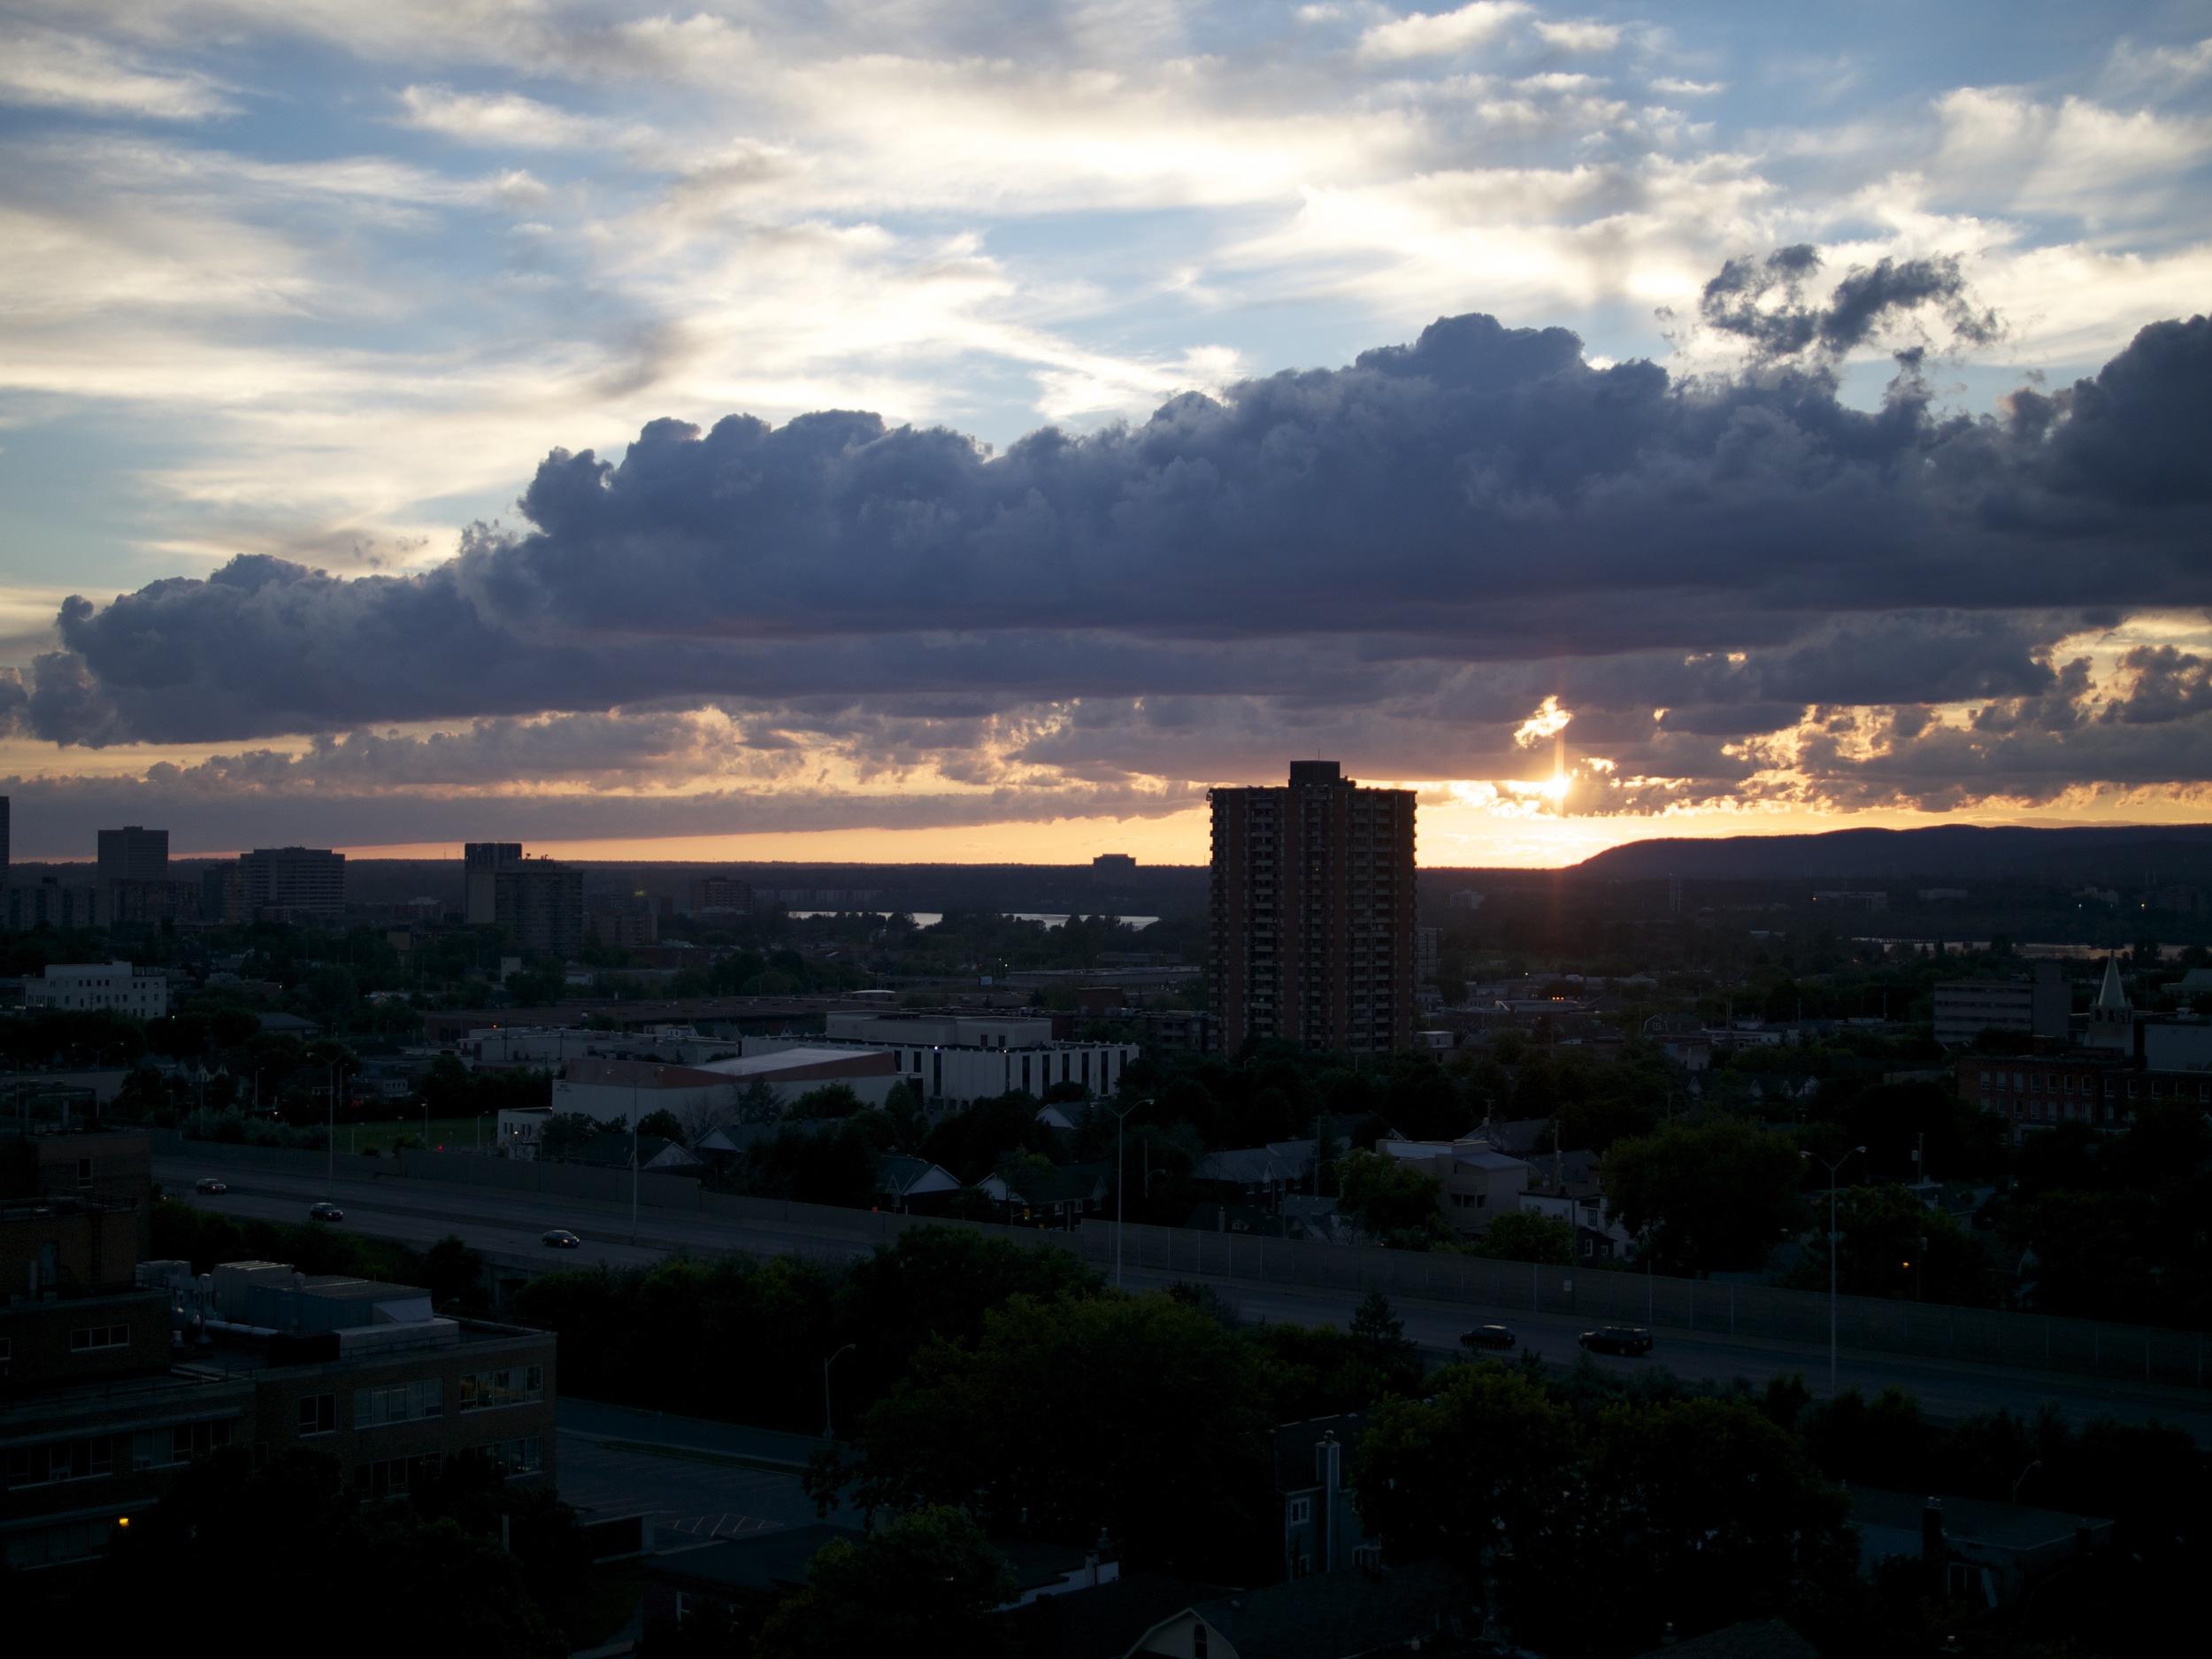 ottawa_sunset.jpg